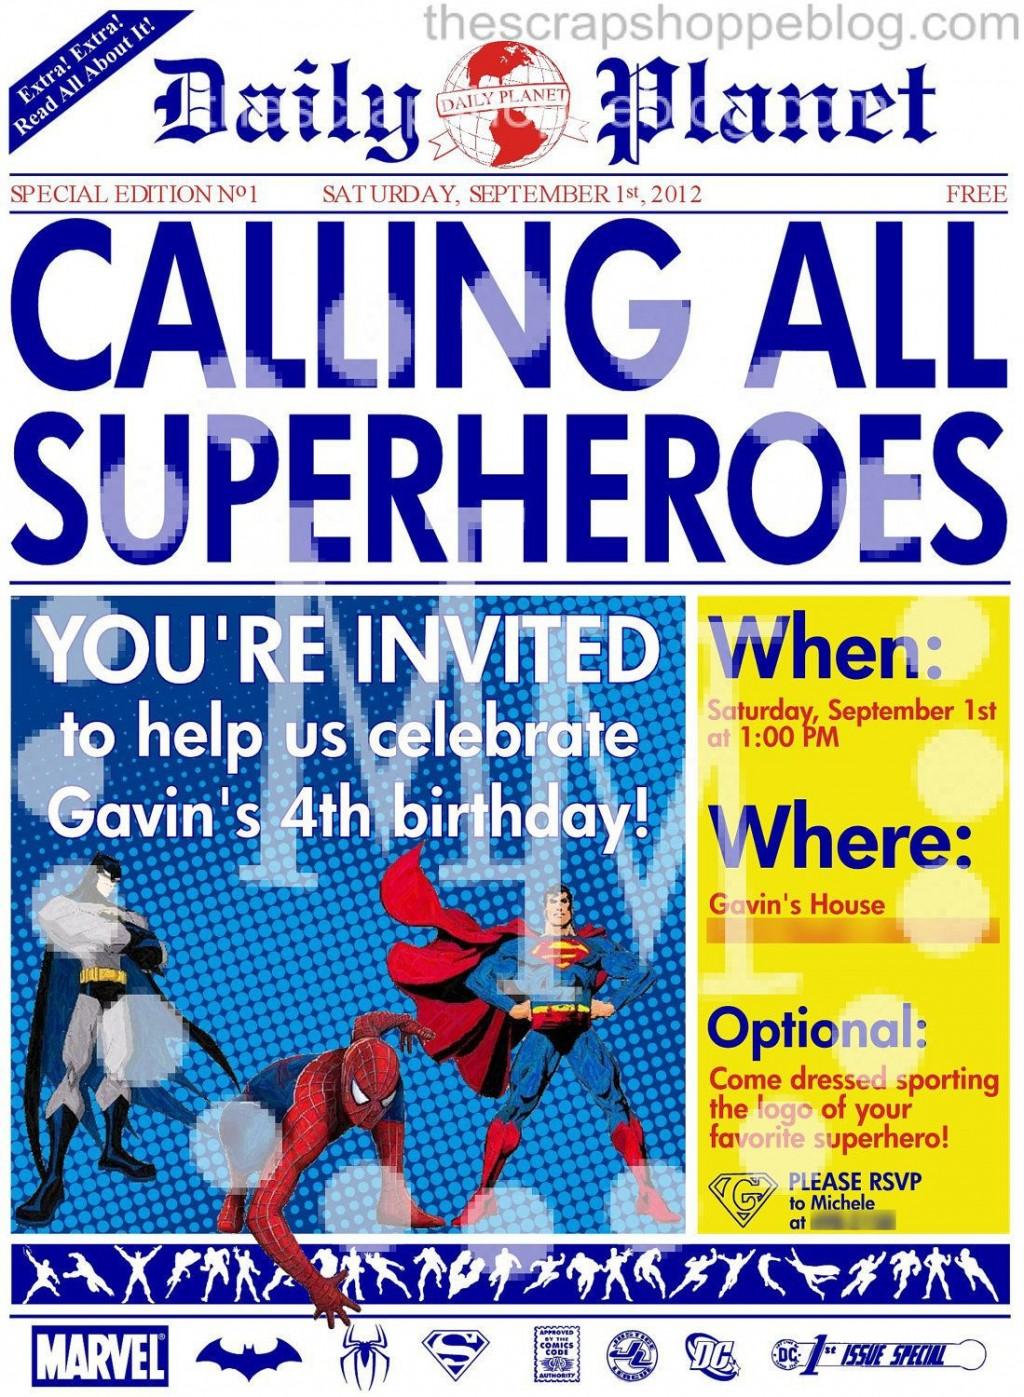 008 Shocking Superhero Newspaper Invitation Template Free Design Large